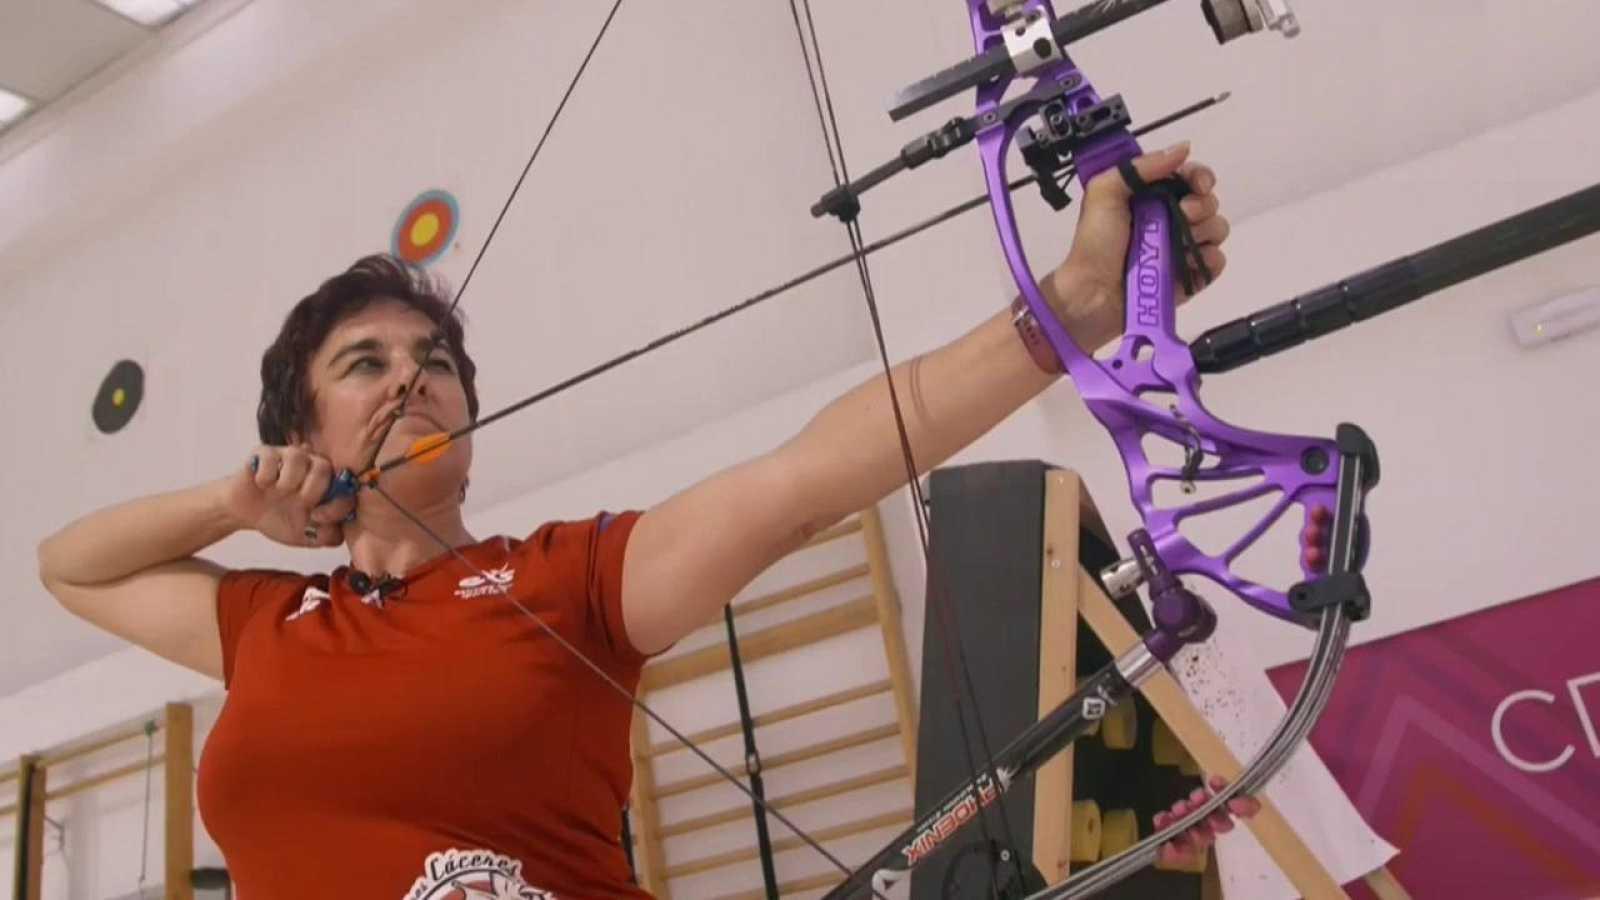 Mujer y deporte - Tiro con arco: Fátima Agudo